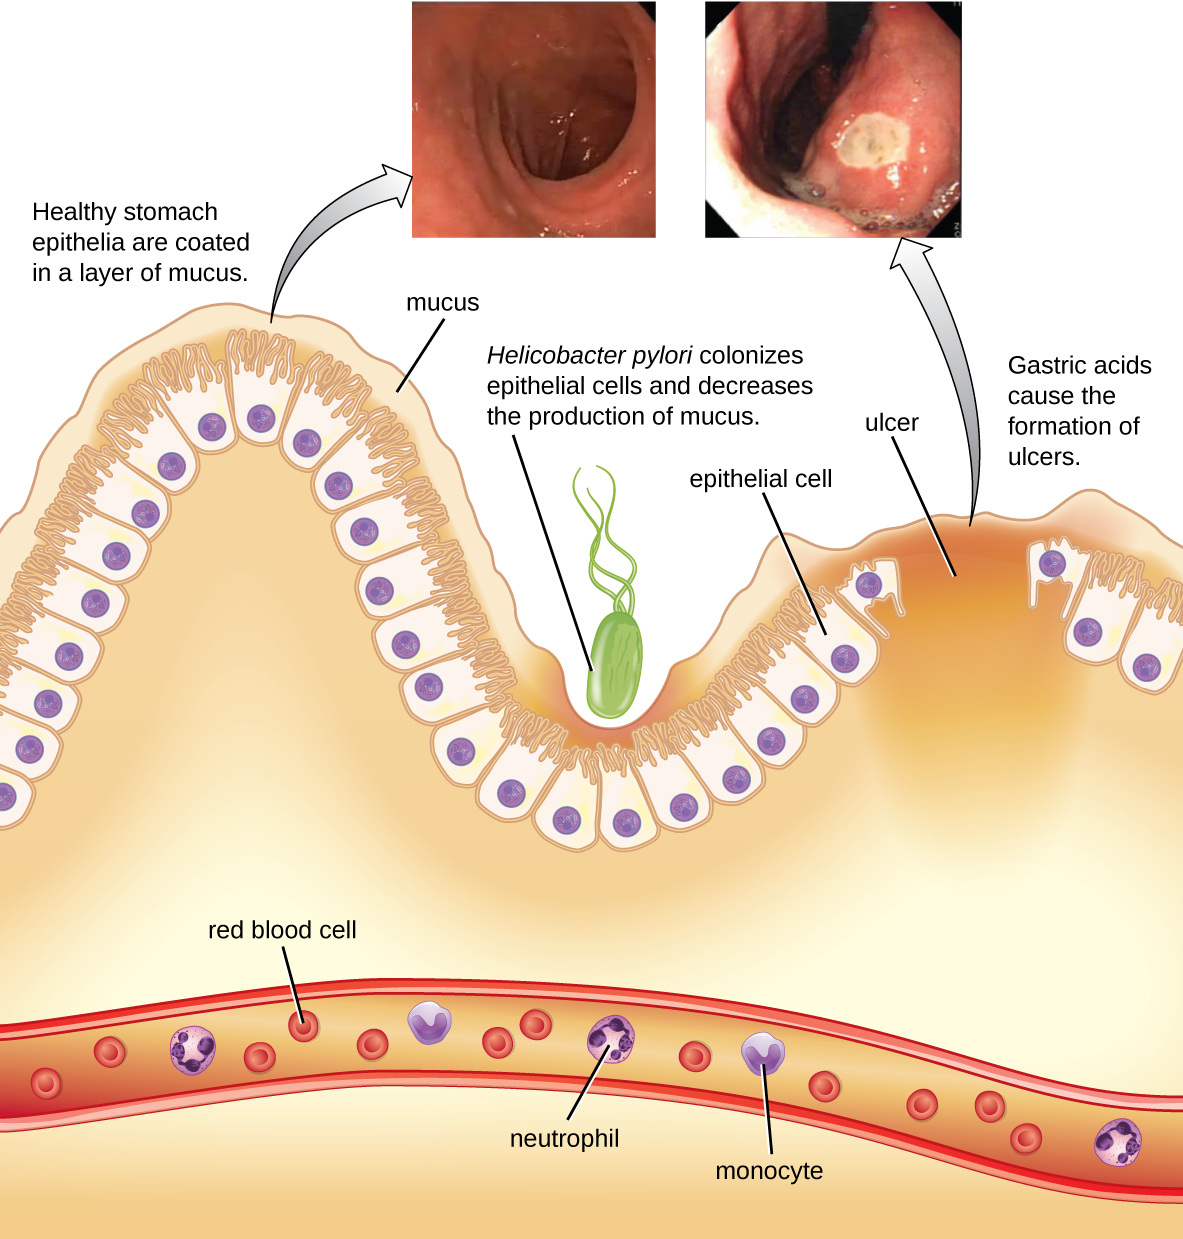 Pathophysiology of peptic ulcer disease